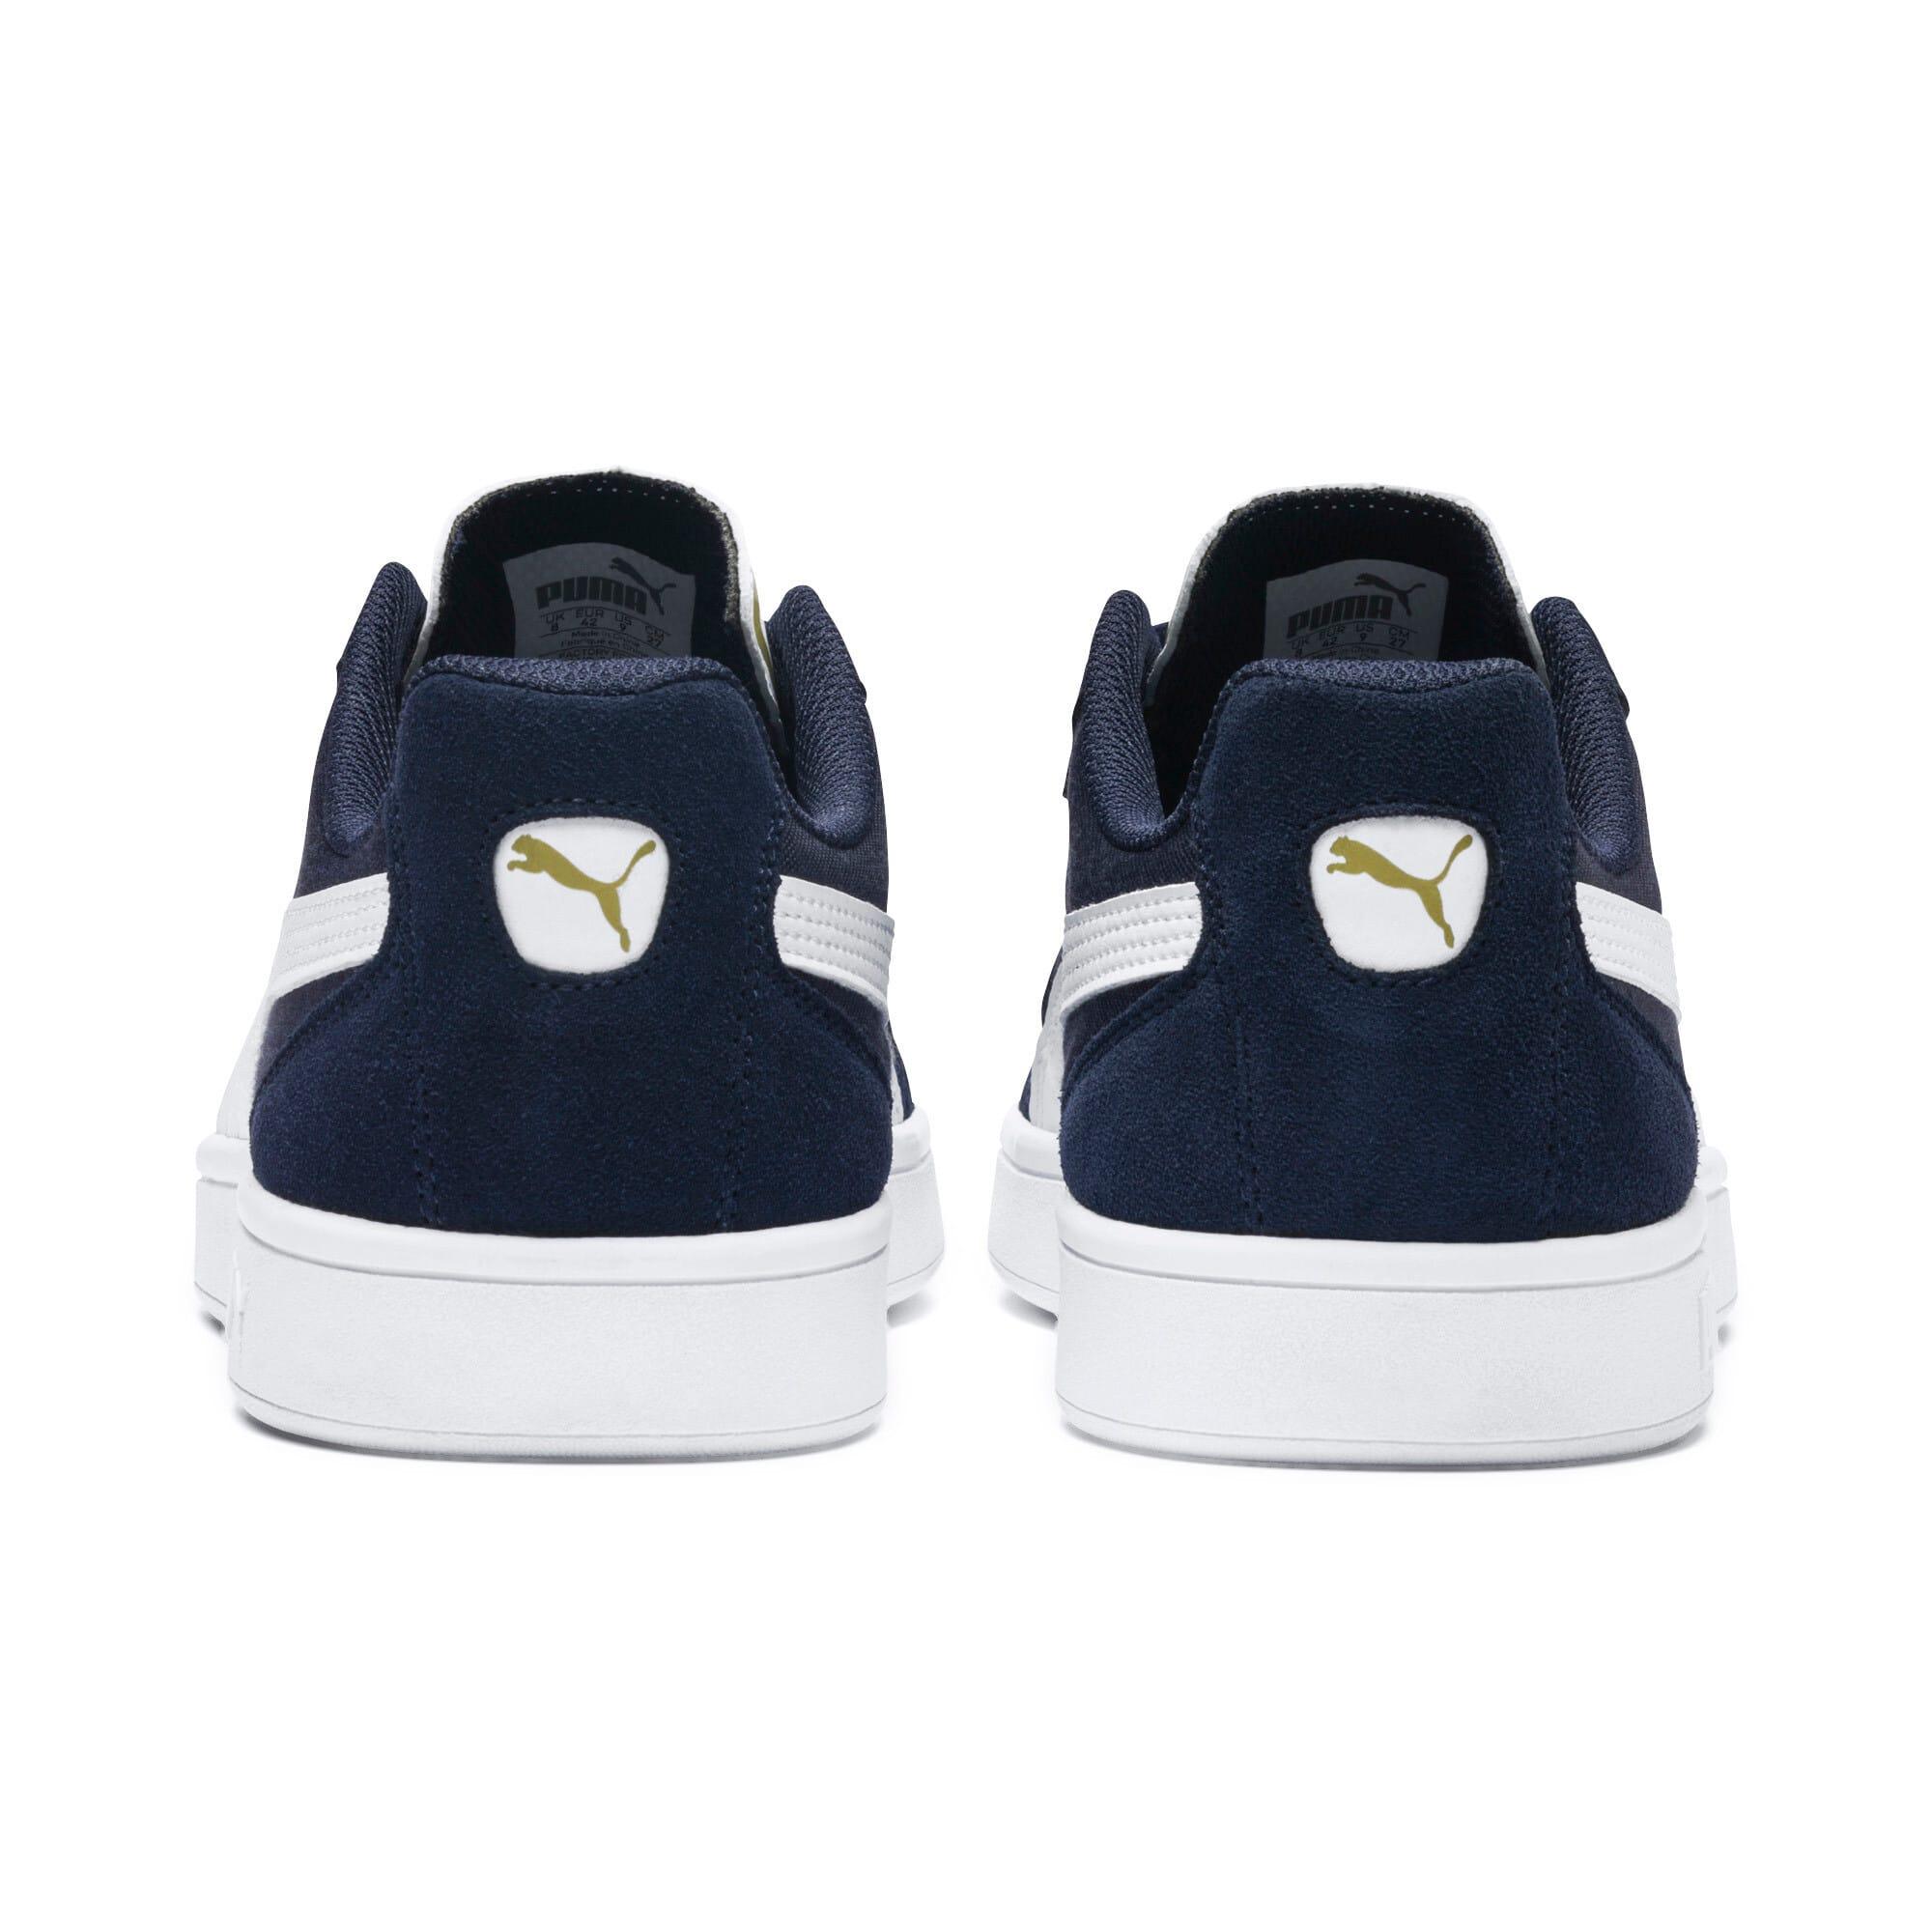 Thumbnail 3 of Astro Kick Sneakers, Peacoat-Puma White, medium